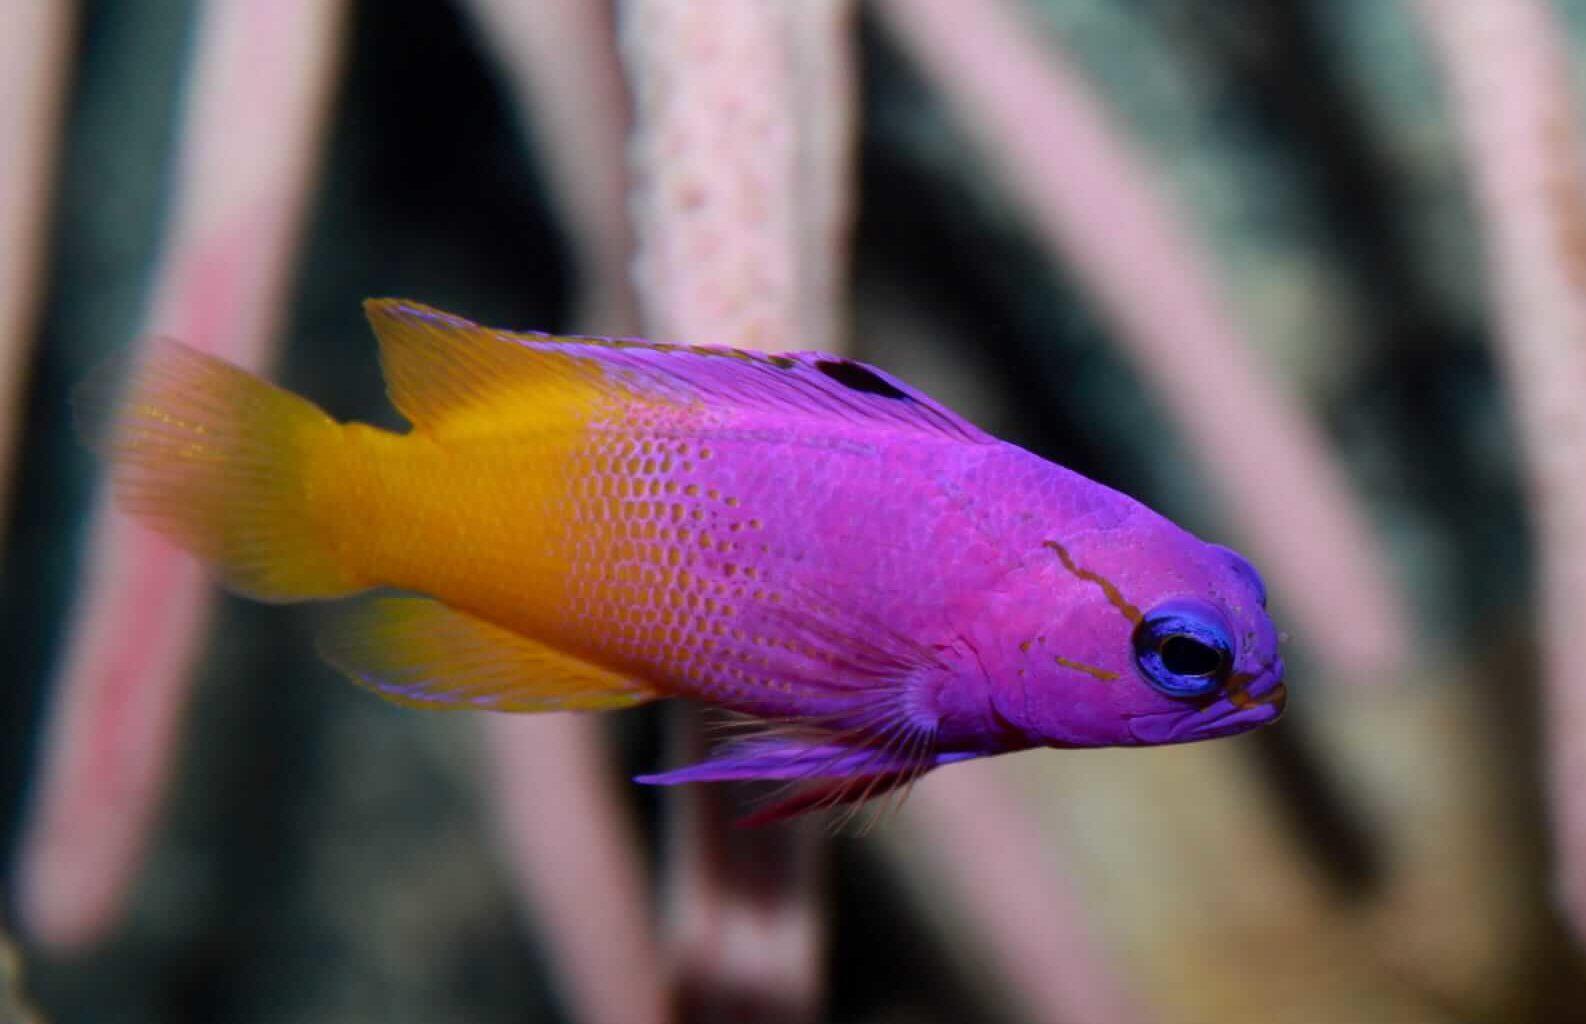 Royal gramma swimming in a reef tank